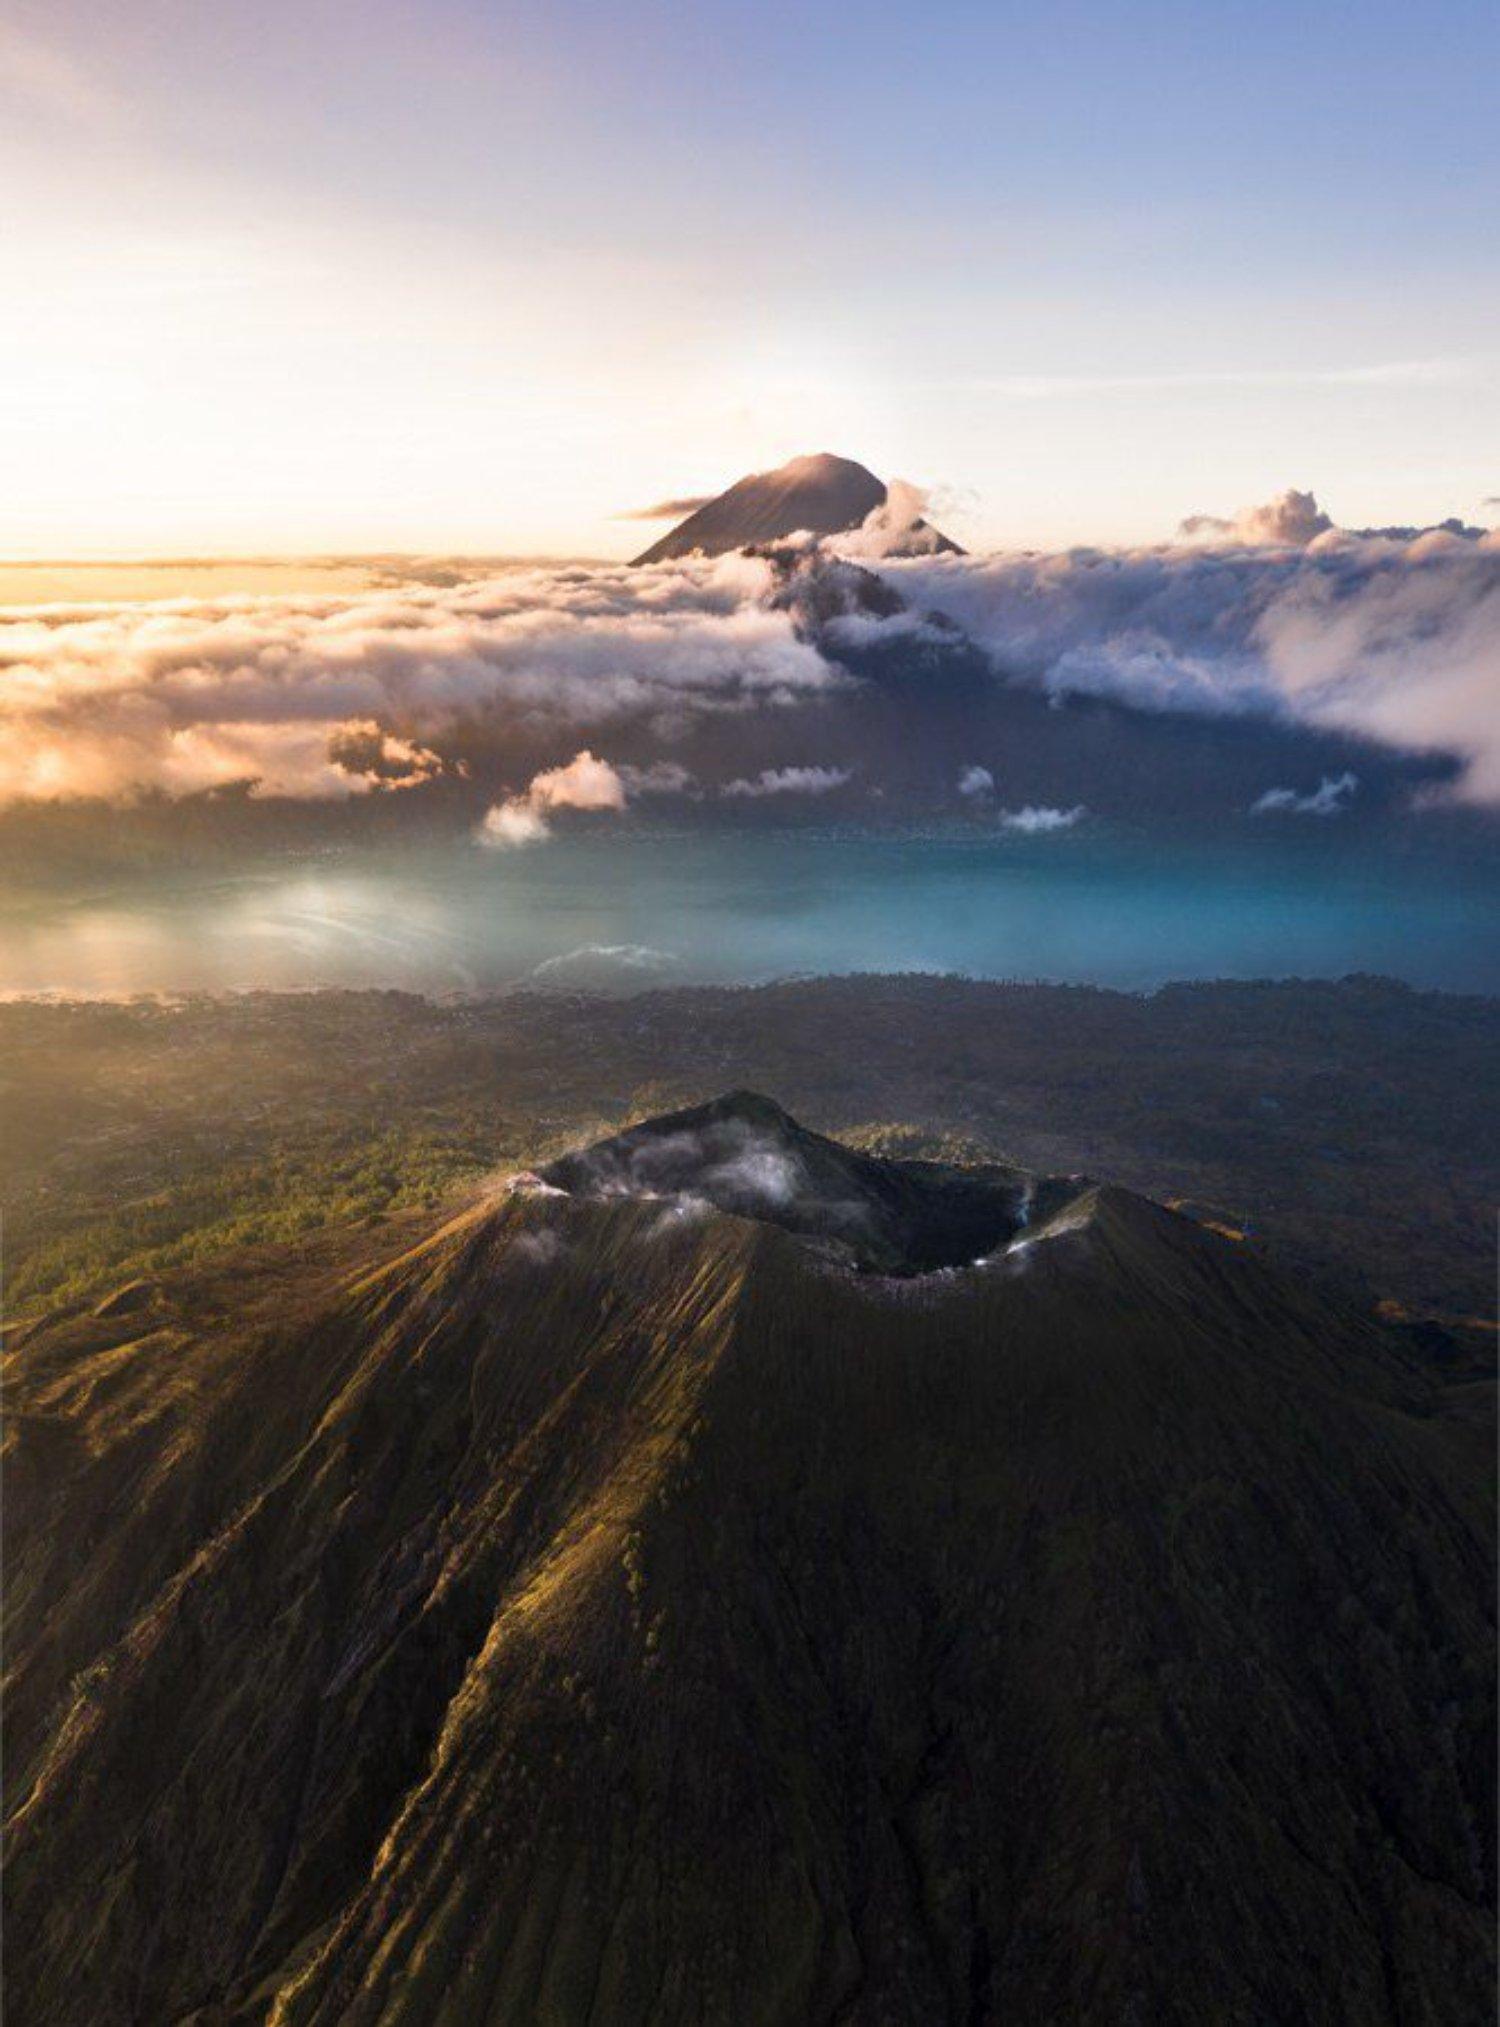 mount batur sunrise trekking bali DJI_0560 Pano 1